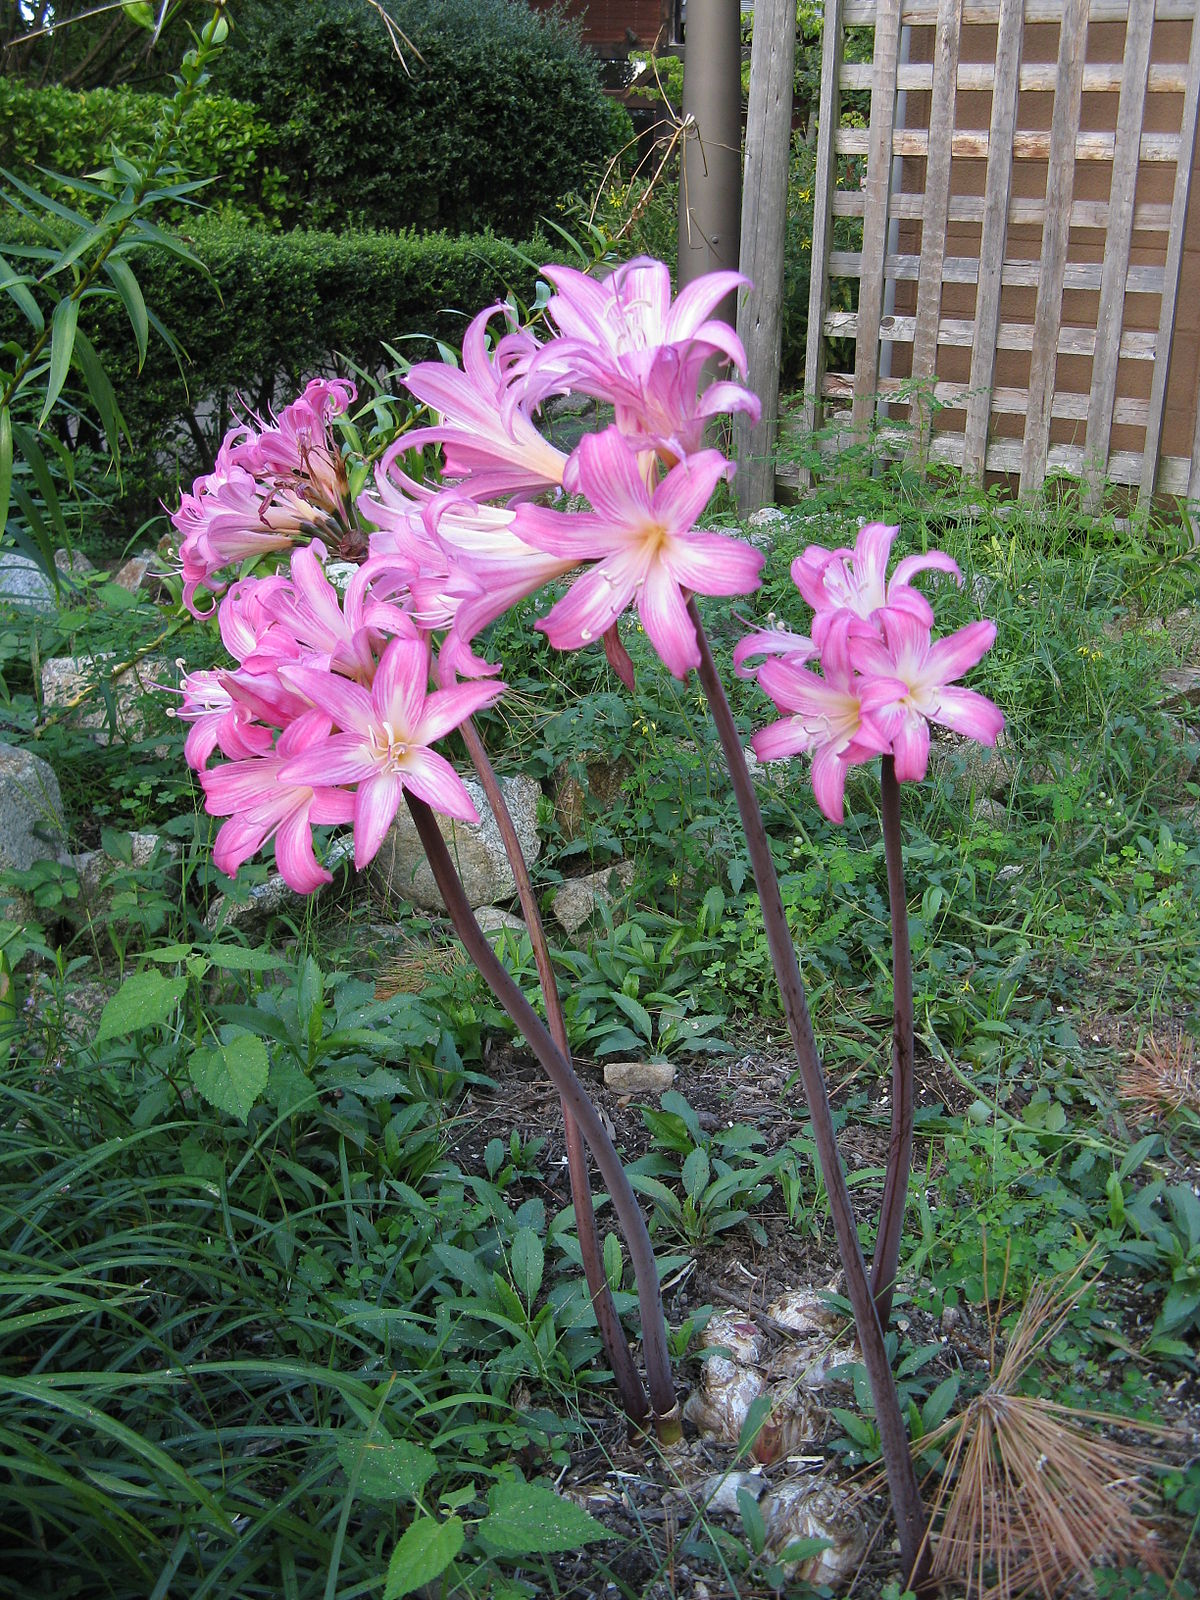 Amaryllis belladonna wikip dia a enciclop dia livre for Amaryllis belladonna vente